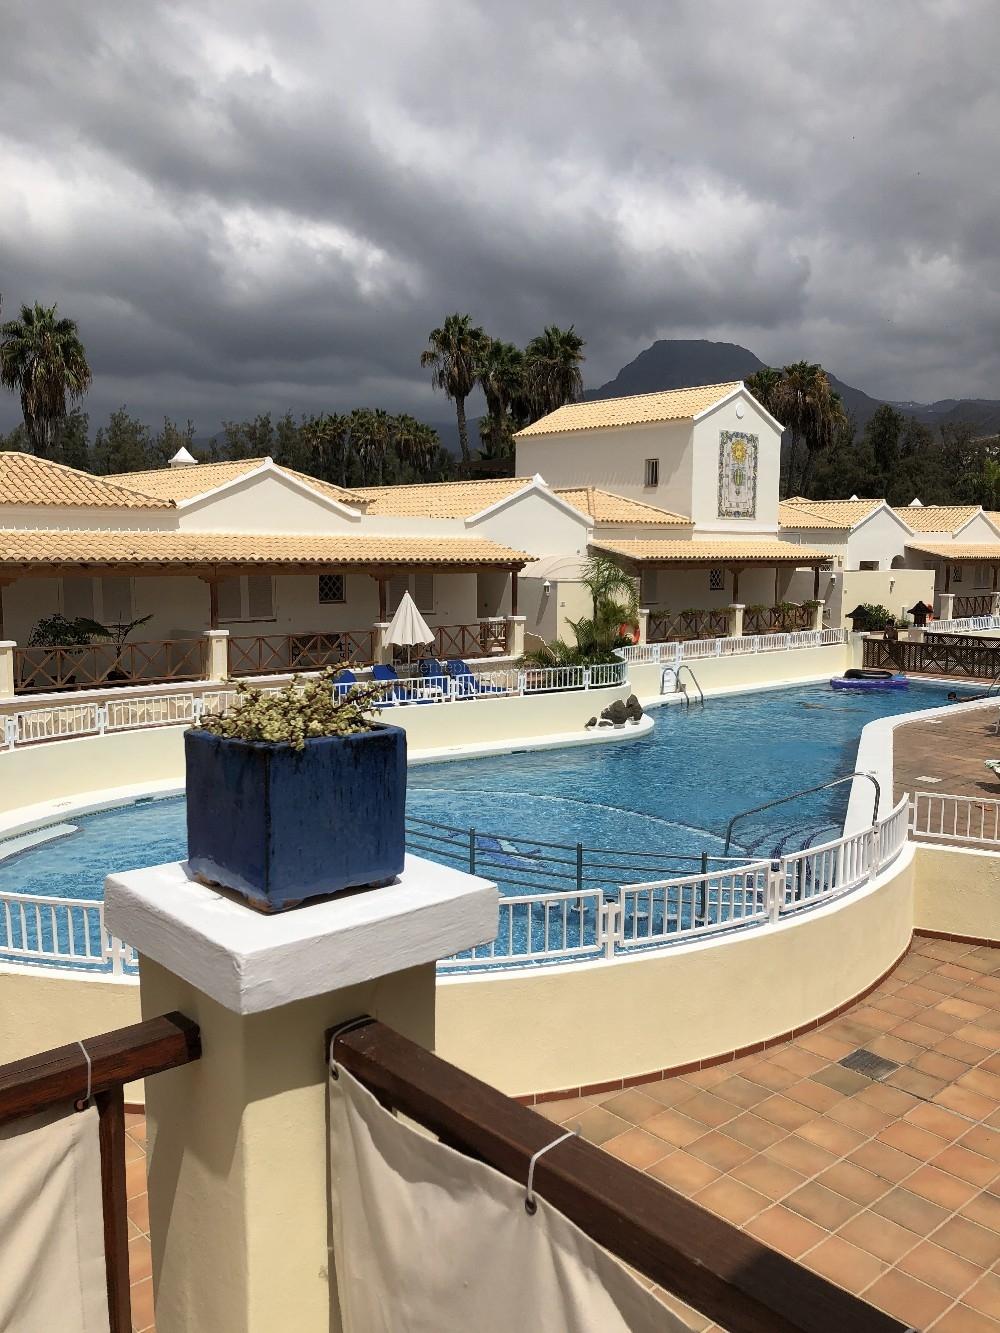 A2PLA655 Townhouse Golf Resort Playa de Las Americas 390000 €